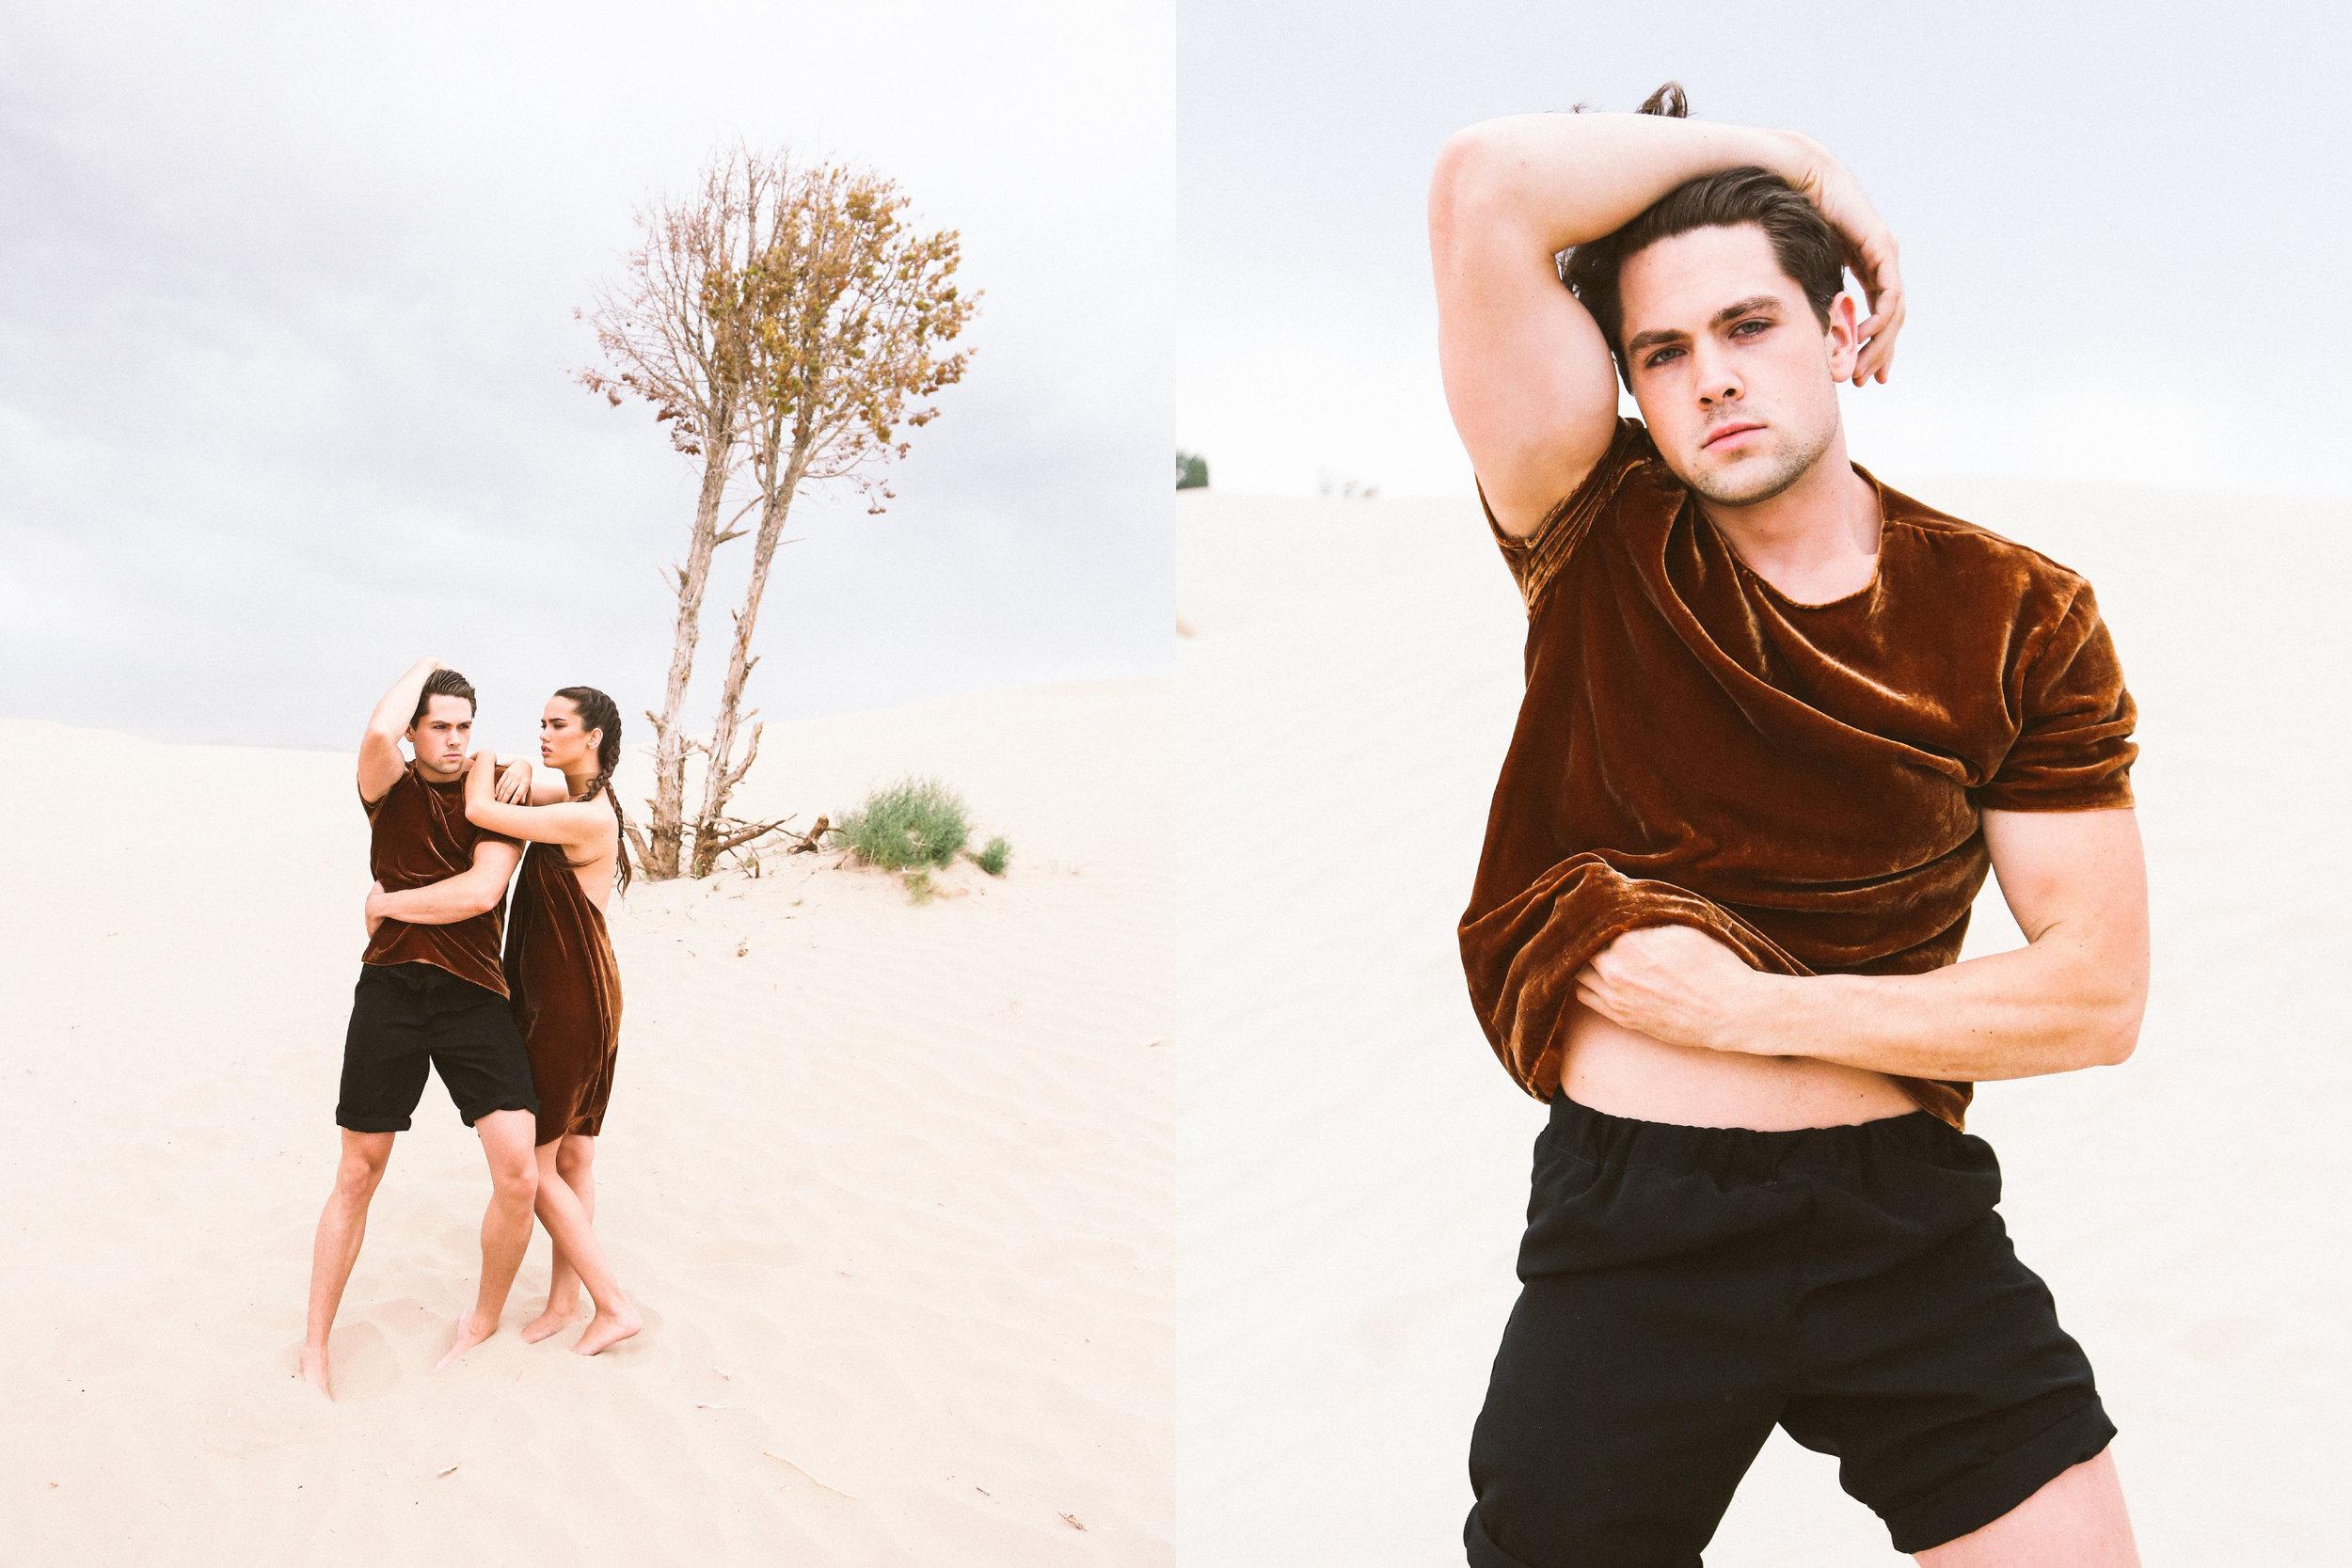 DETAILS  Photography: Evelyn Eslava  Makeup: Chelsea Vuksinick  Wardrobe: Melody Noy  Models (left to right): Dereck Richmond , Tiffany Pliler  Styling by: Megan Beckham